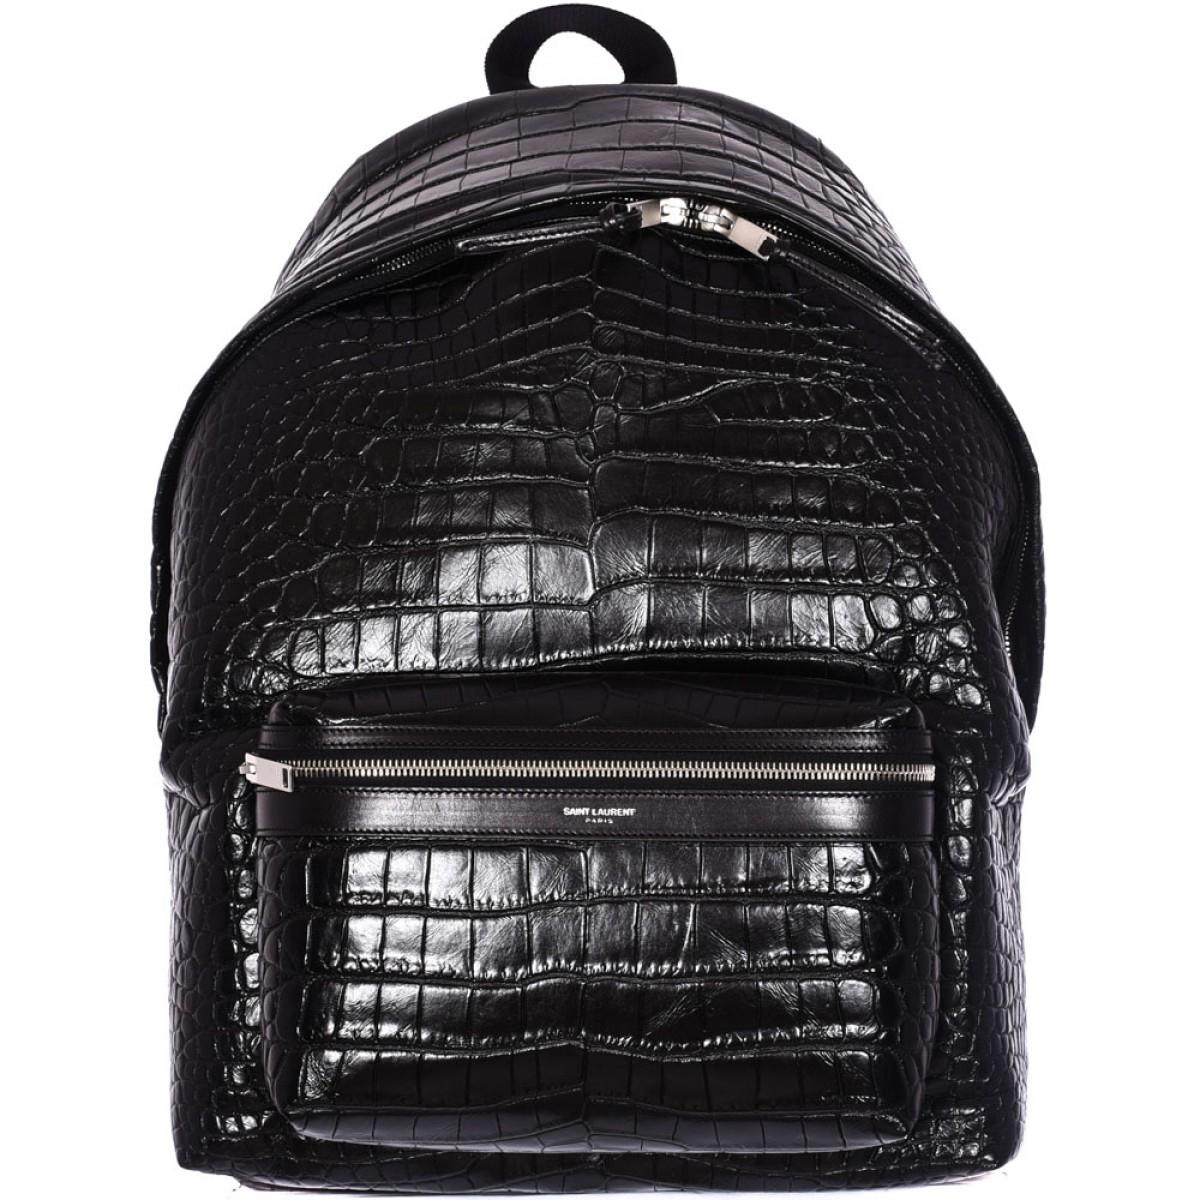 Crocodile Backpack – TrendBackpack